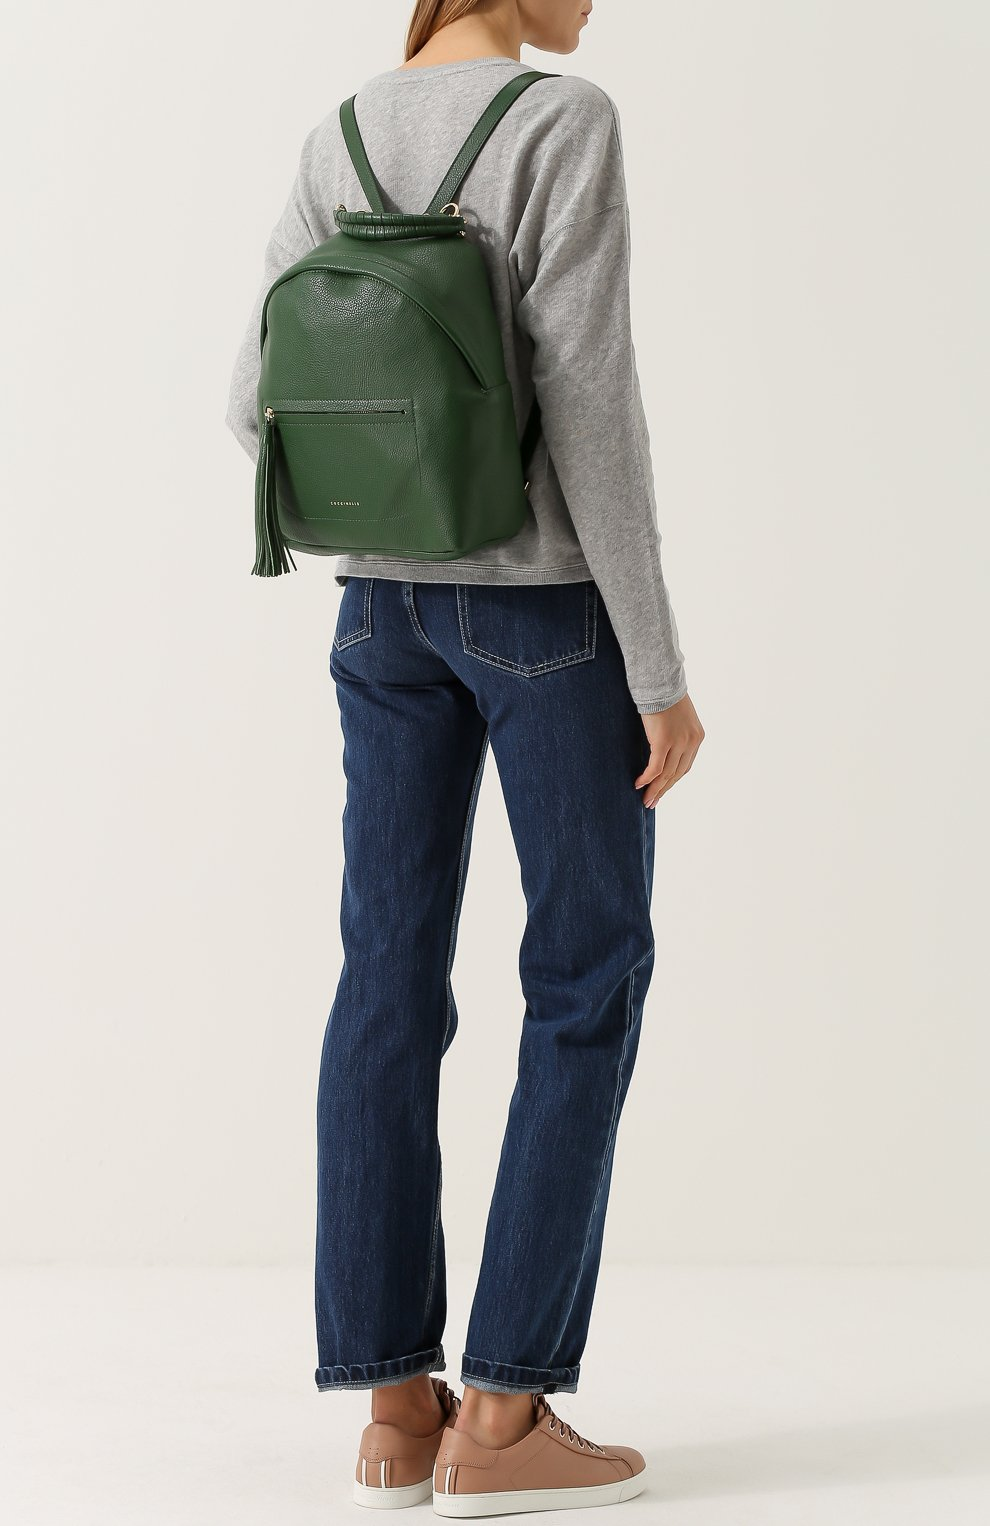 Рюкзак Leonie Coccinelle зеленый   Фото №2